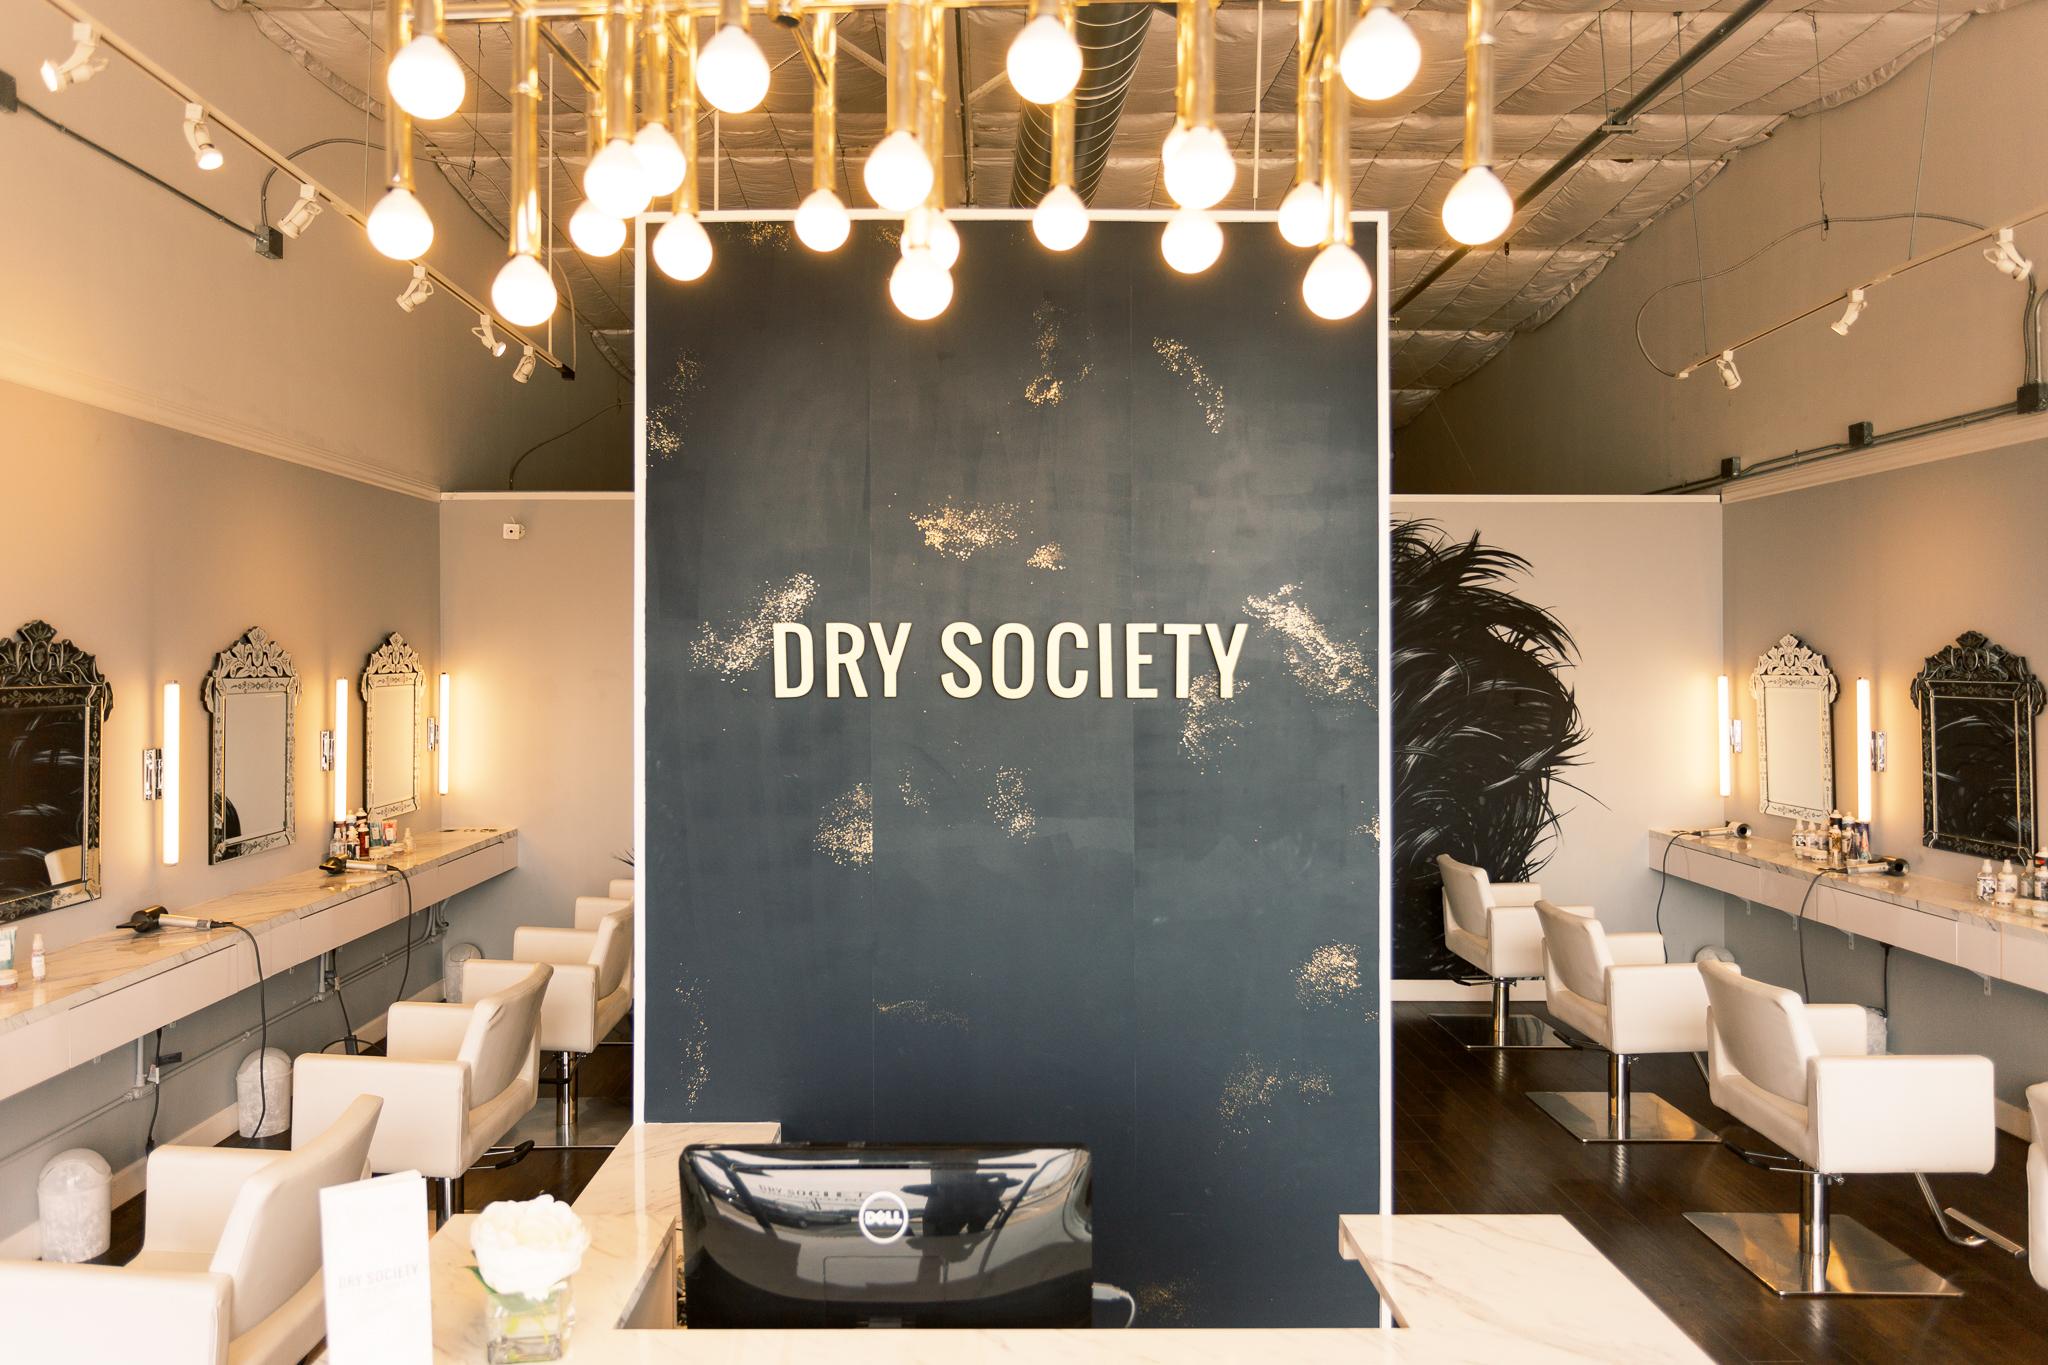 dry society-6.jpg